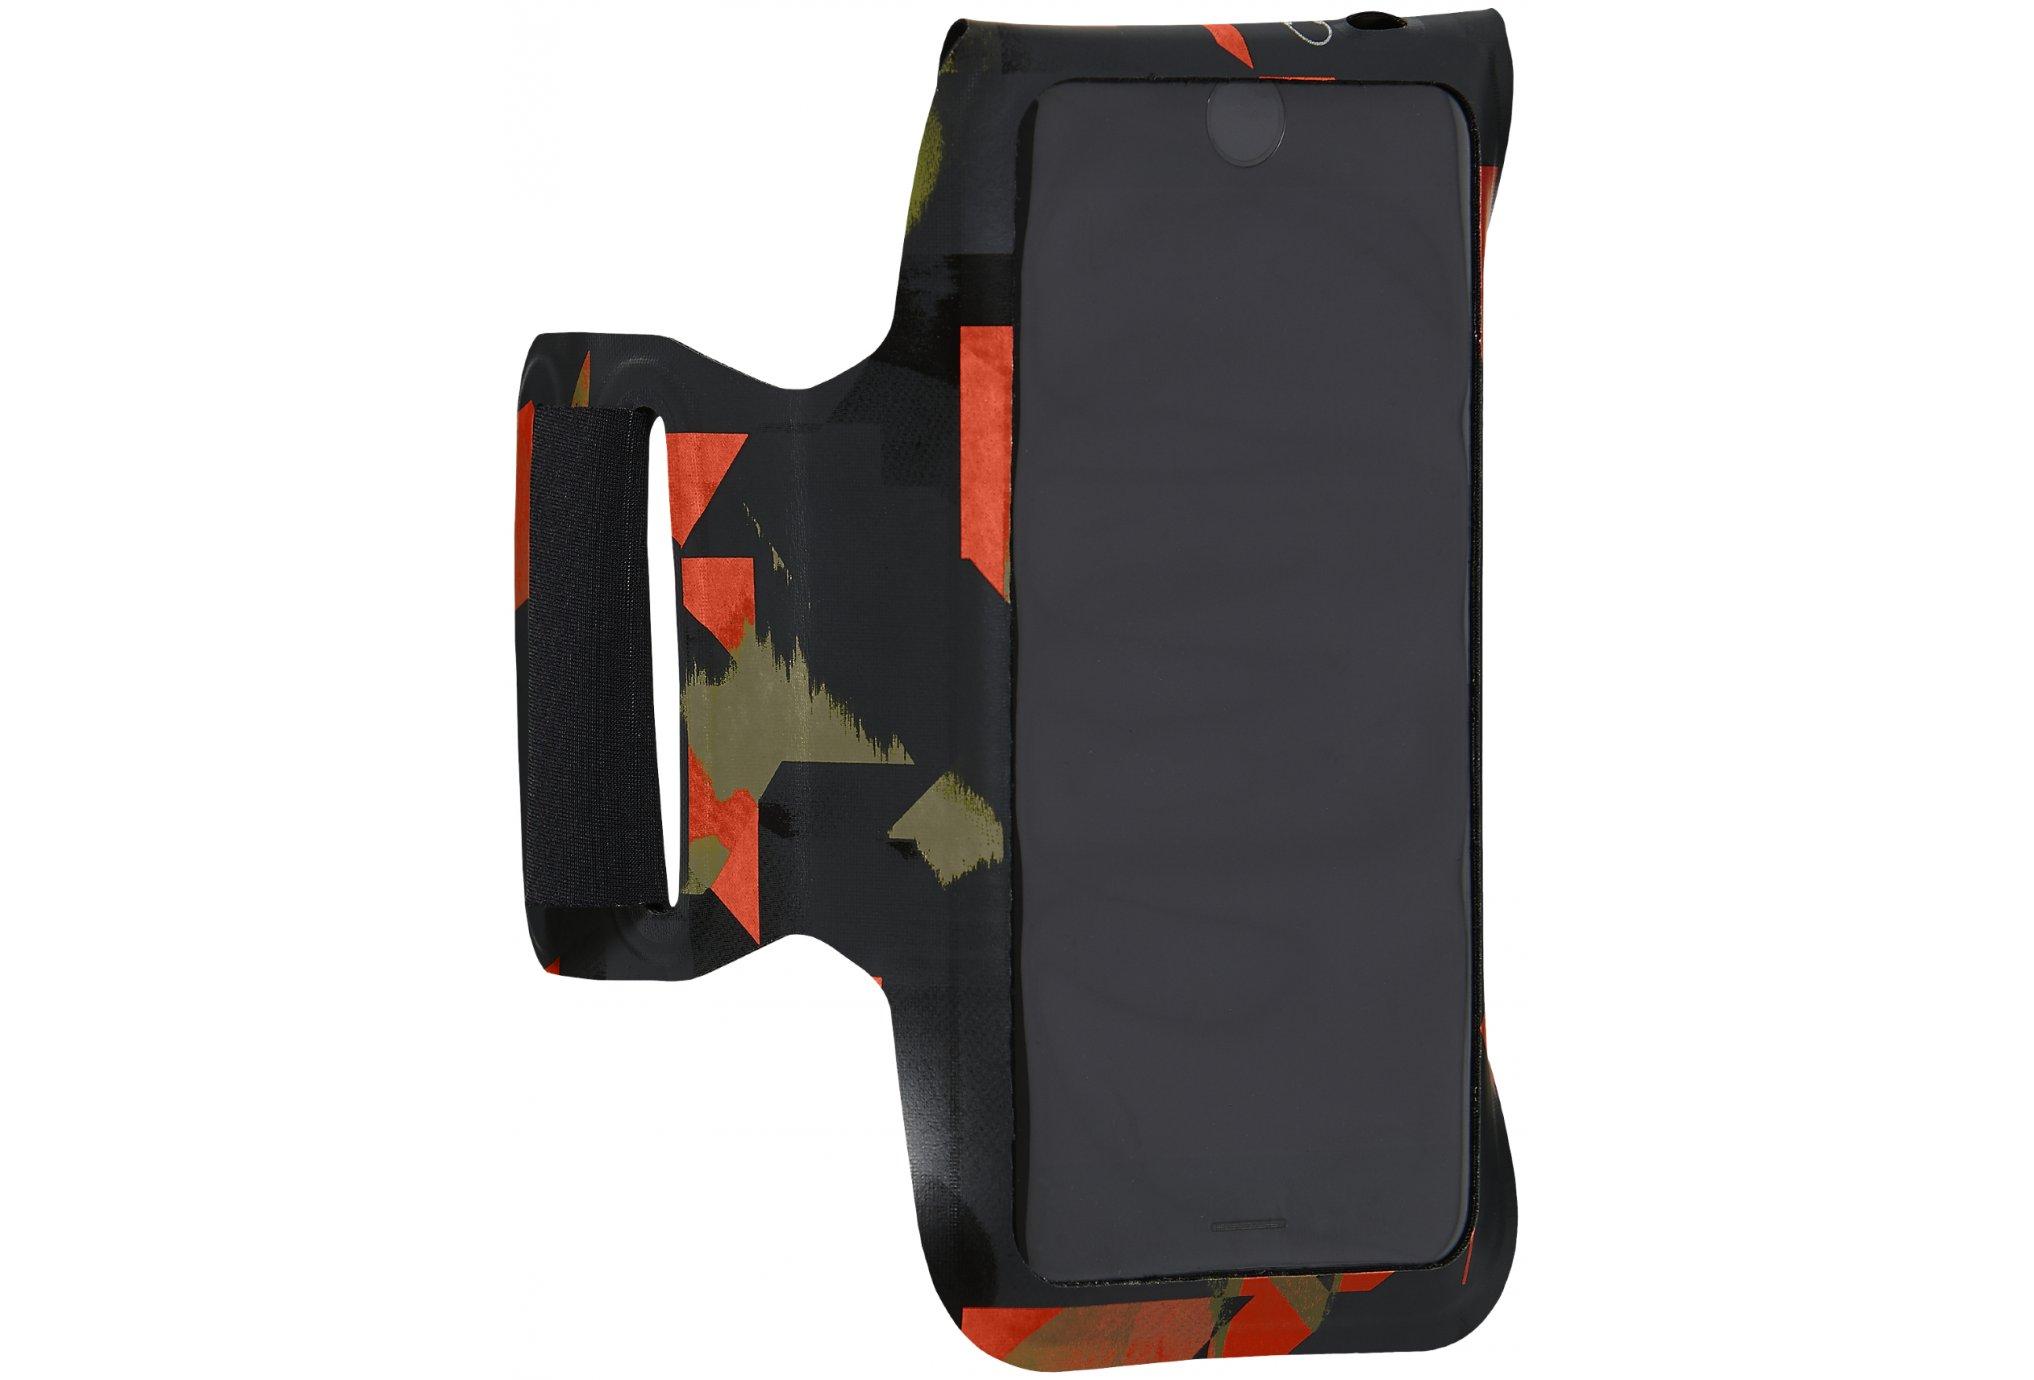 Asics Brassard mp3 accessoires téléphone